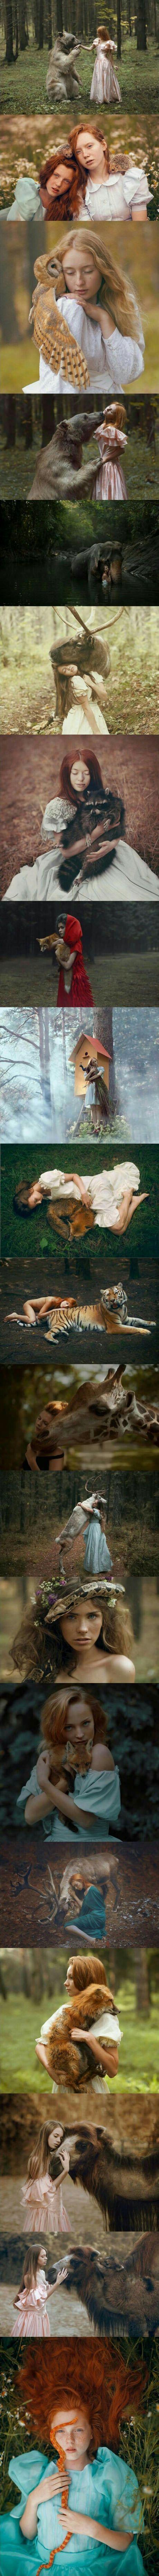 Russian photographer Katerina Plotnikova takes stunning portraits with real animals